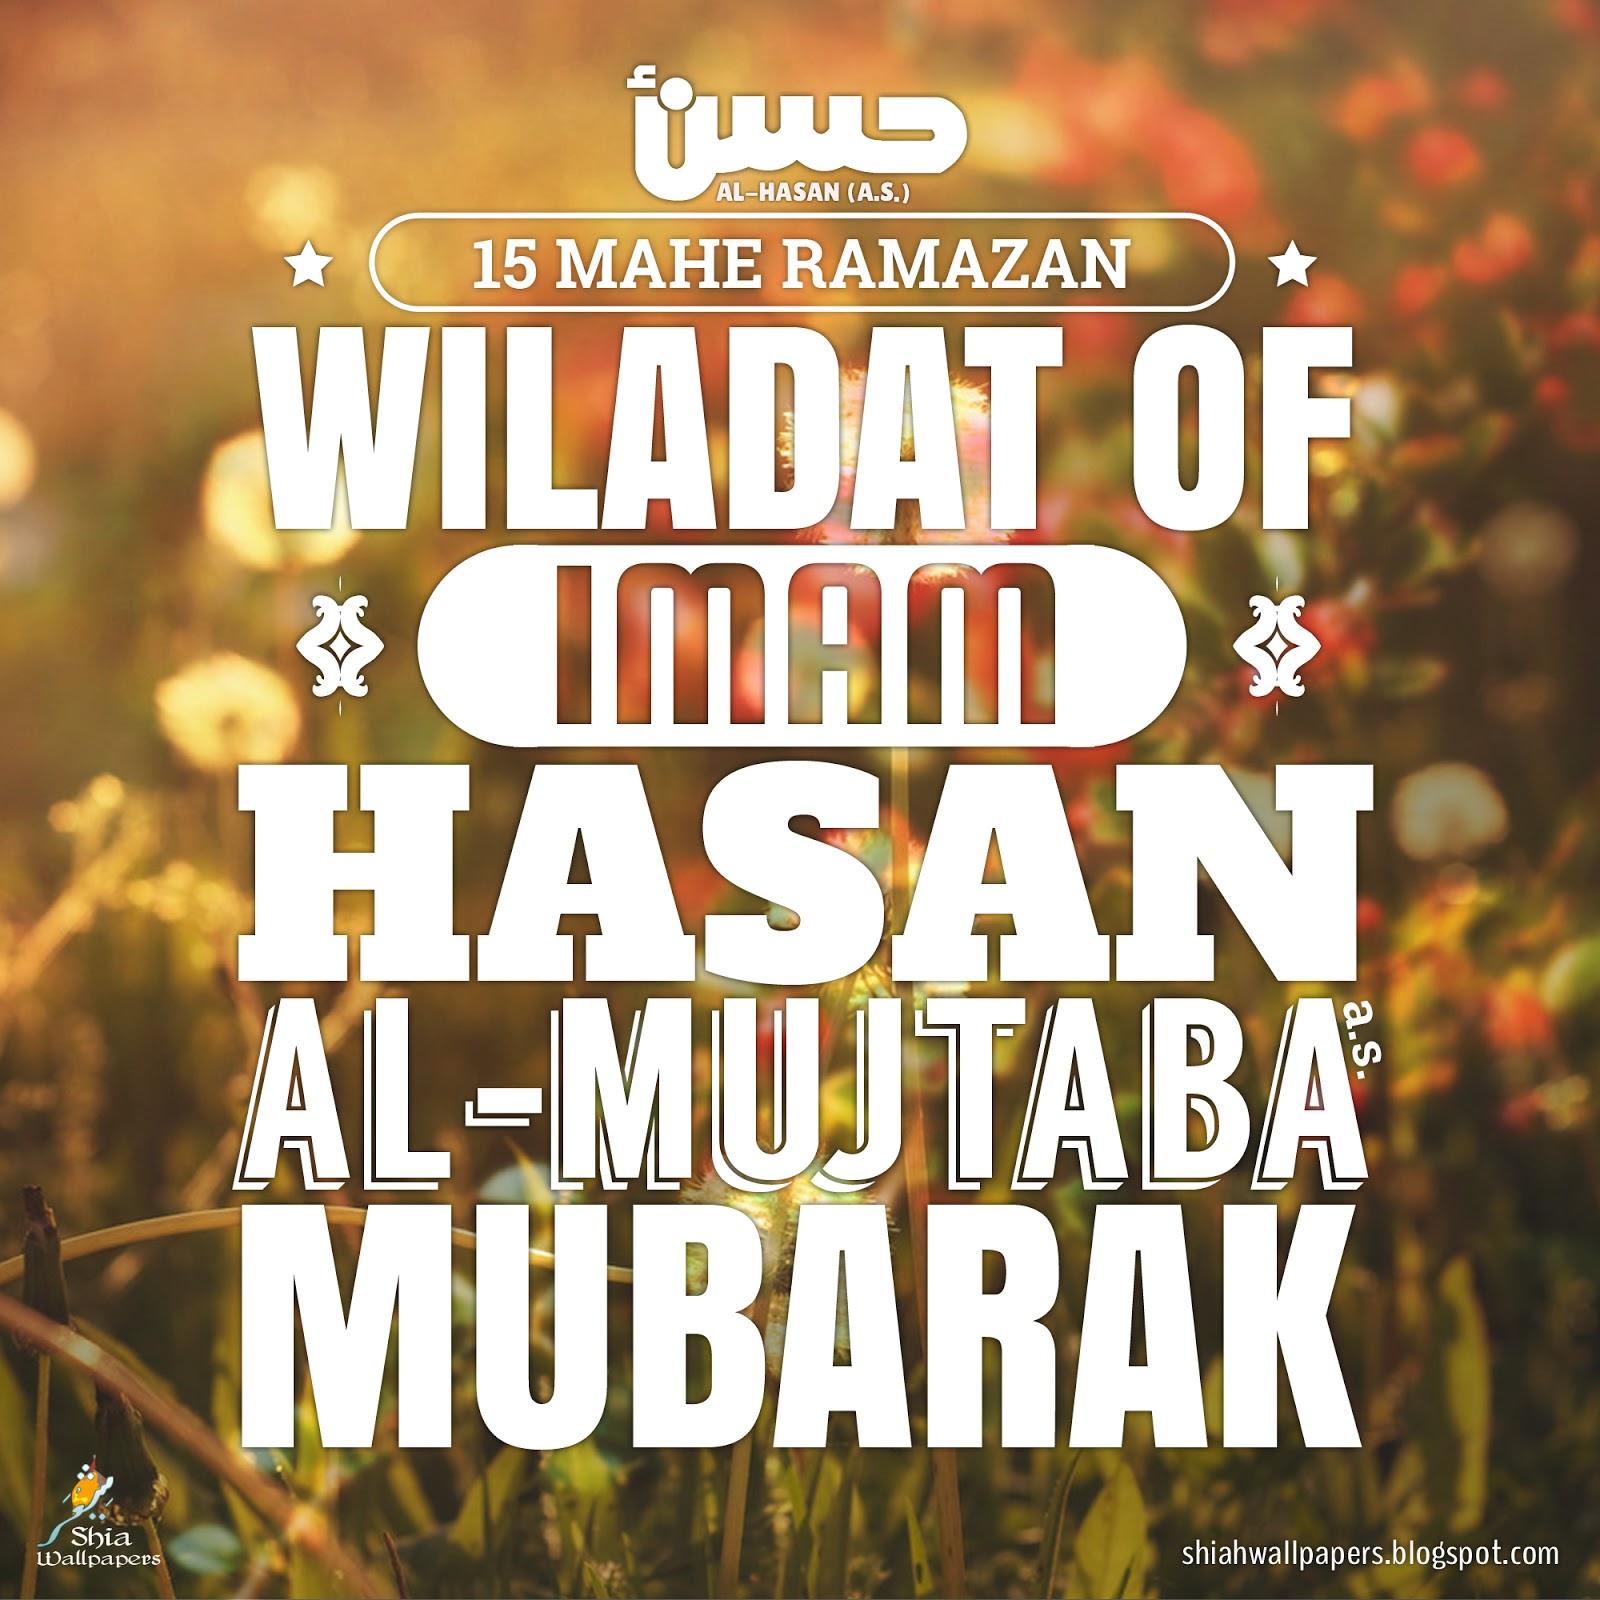 Imam-hasan_wiladat-mubarak.jpg